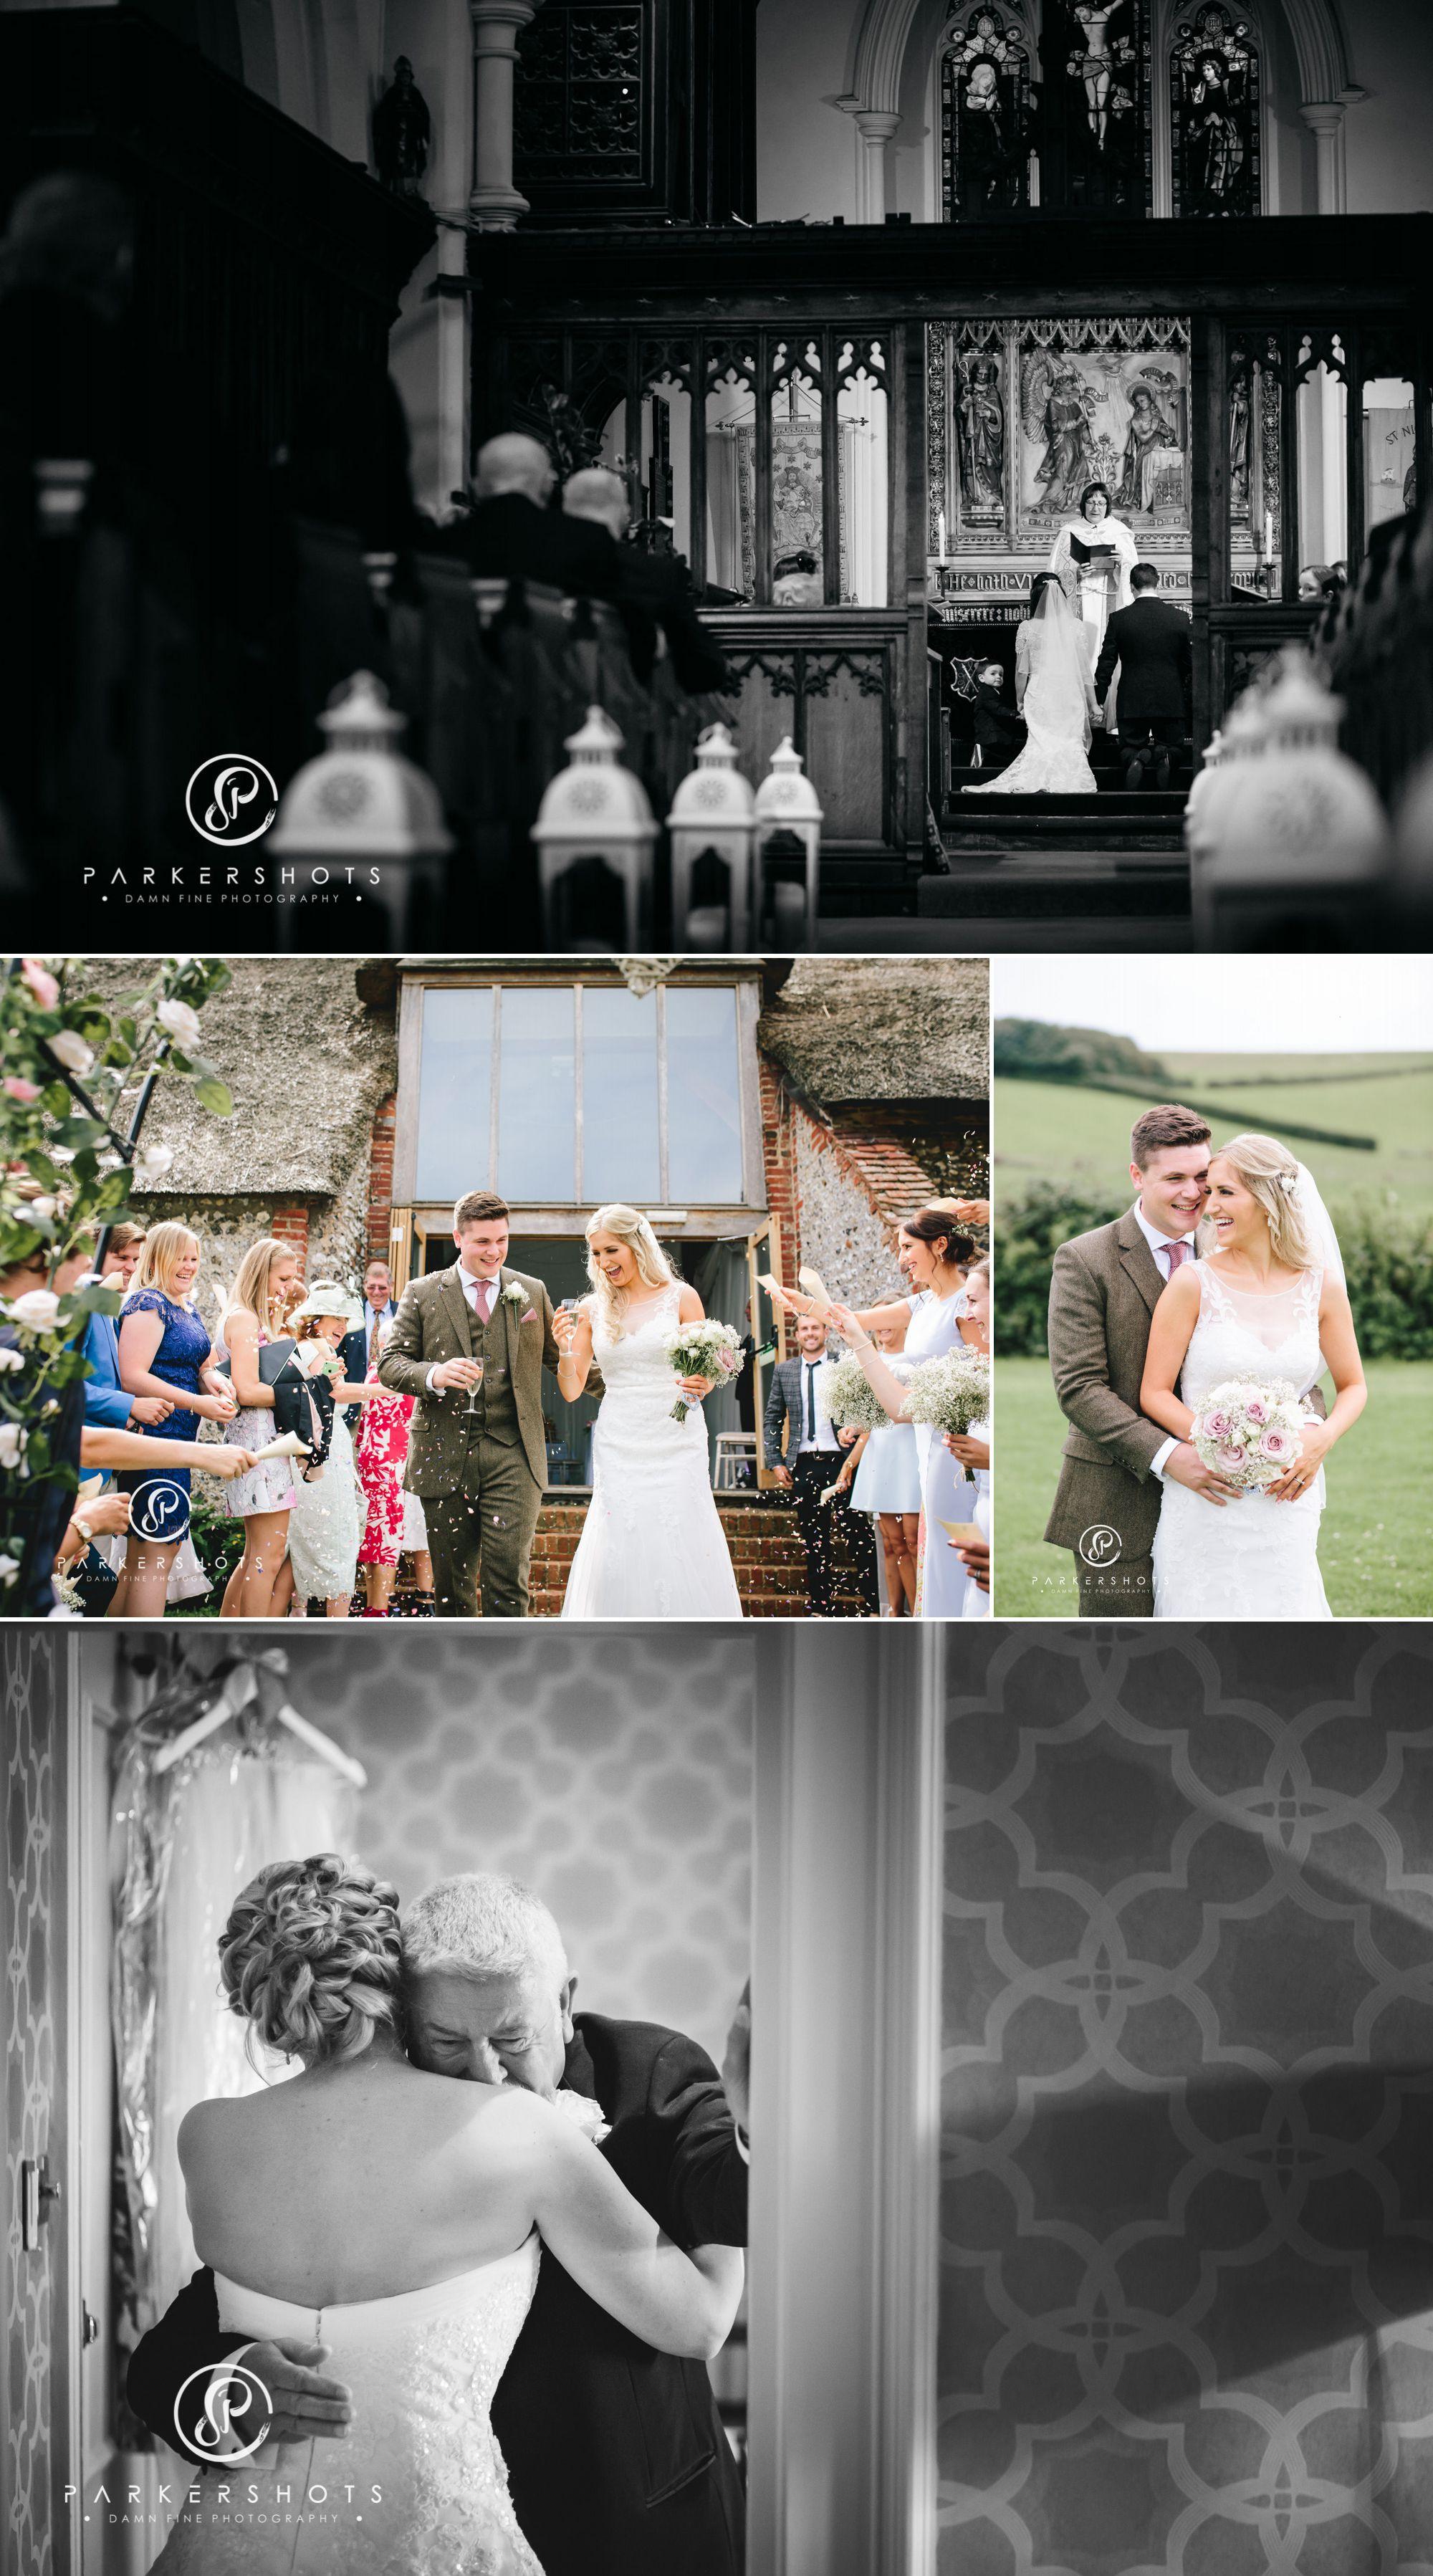 Best_Of_Wedding_Photographer_2015 26